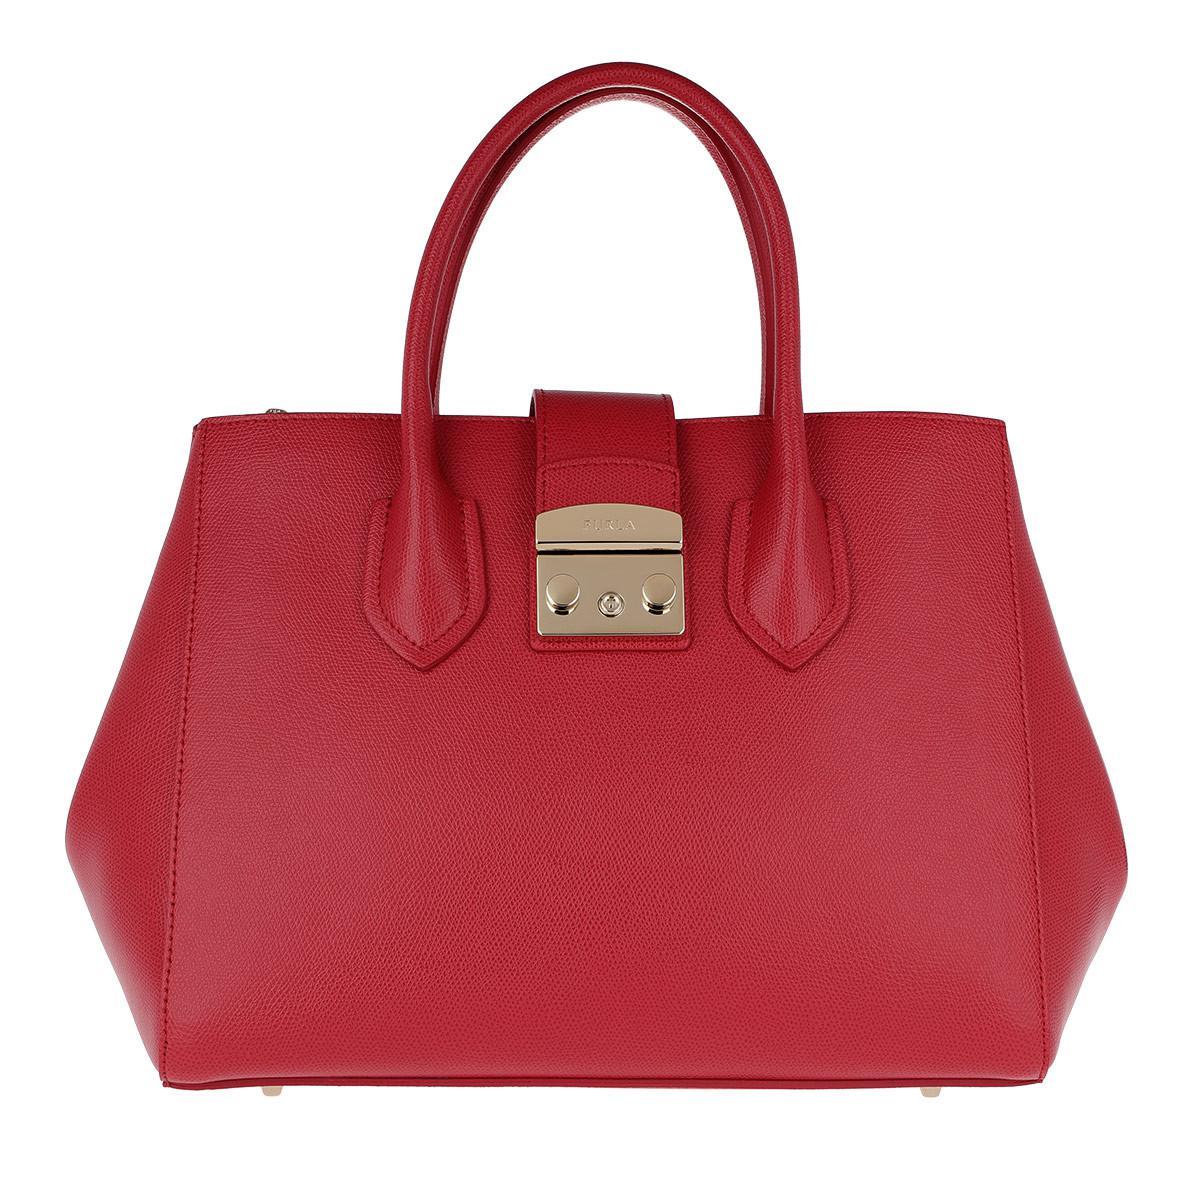 Furla Metropolis M red leather bag DiB5cr9